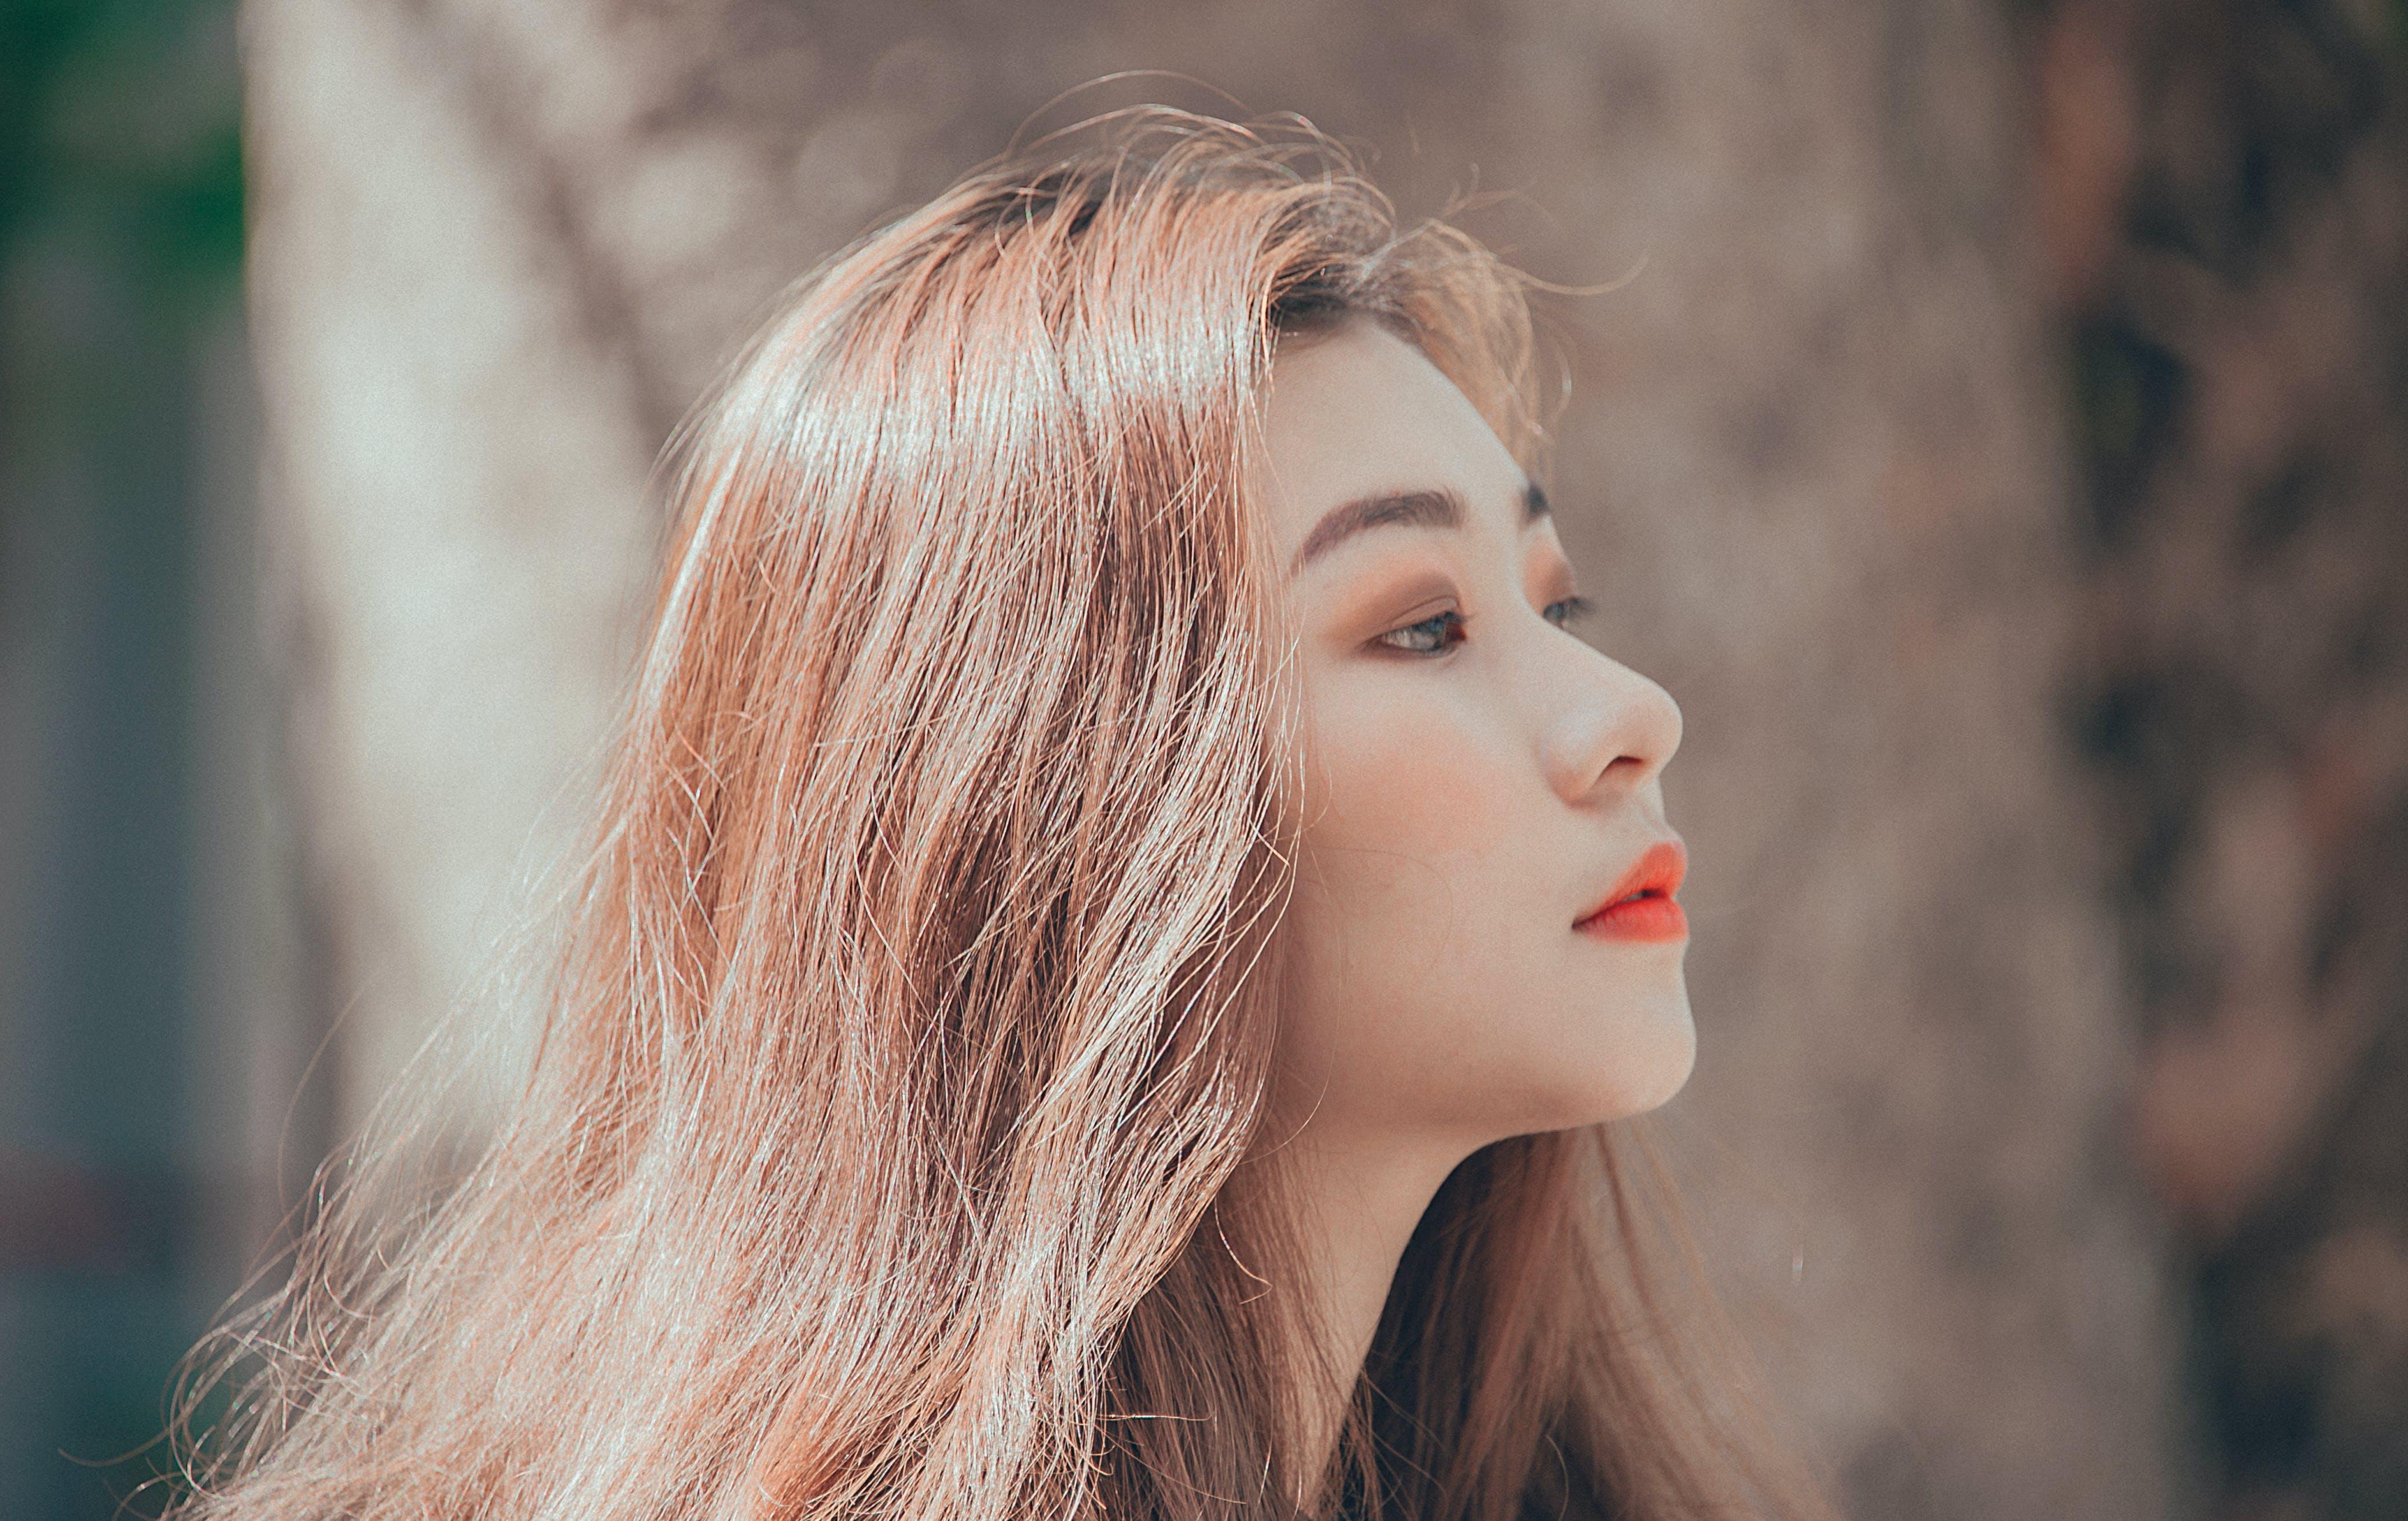 Gratis arkivbilde med ansiktsuttrykk, Asiatisk, asiatisk jente, attraktiv